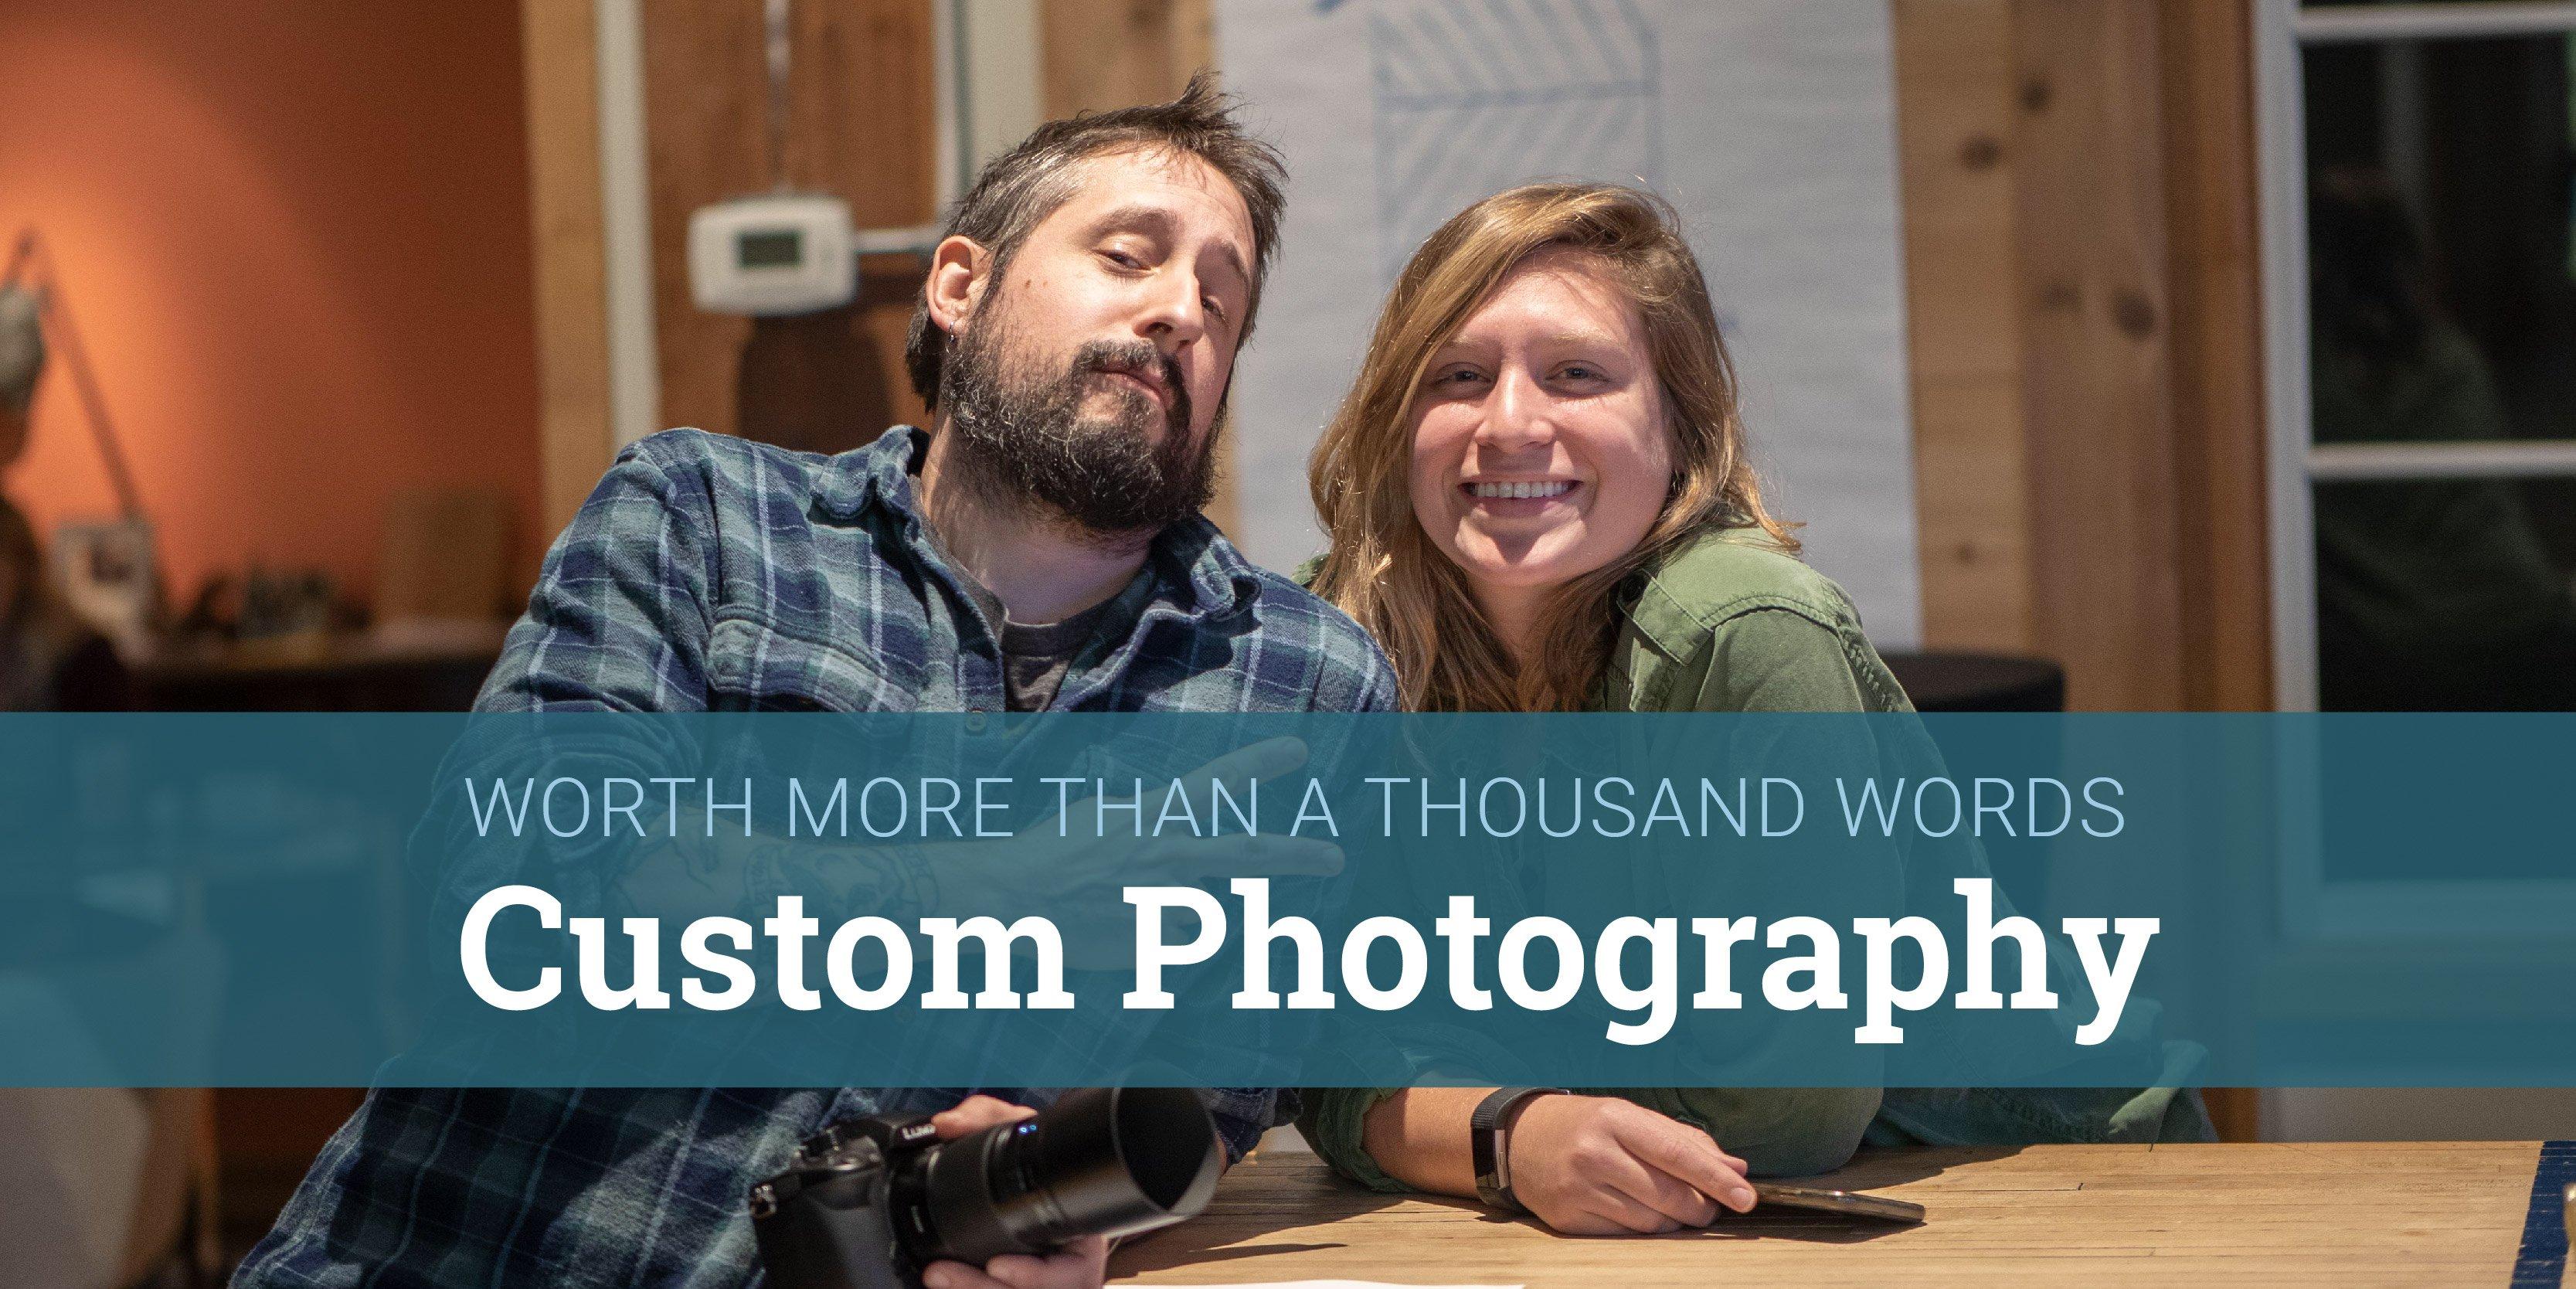 customphotography-07